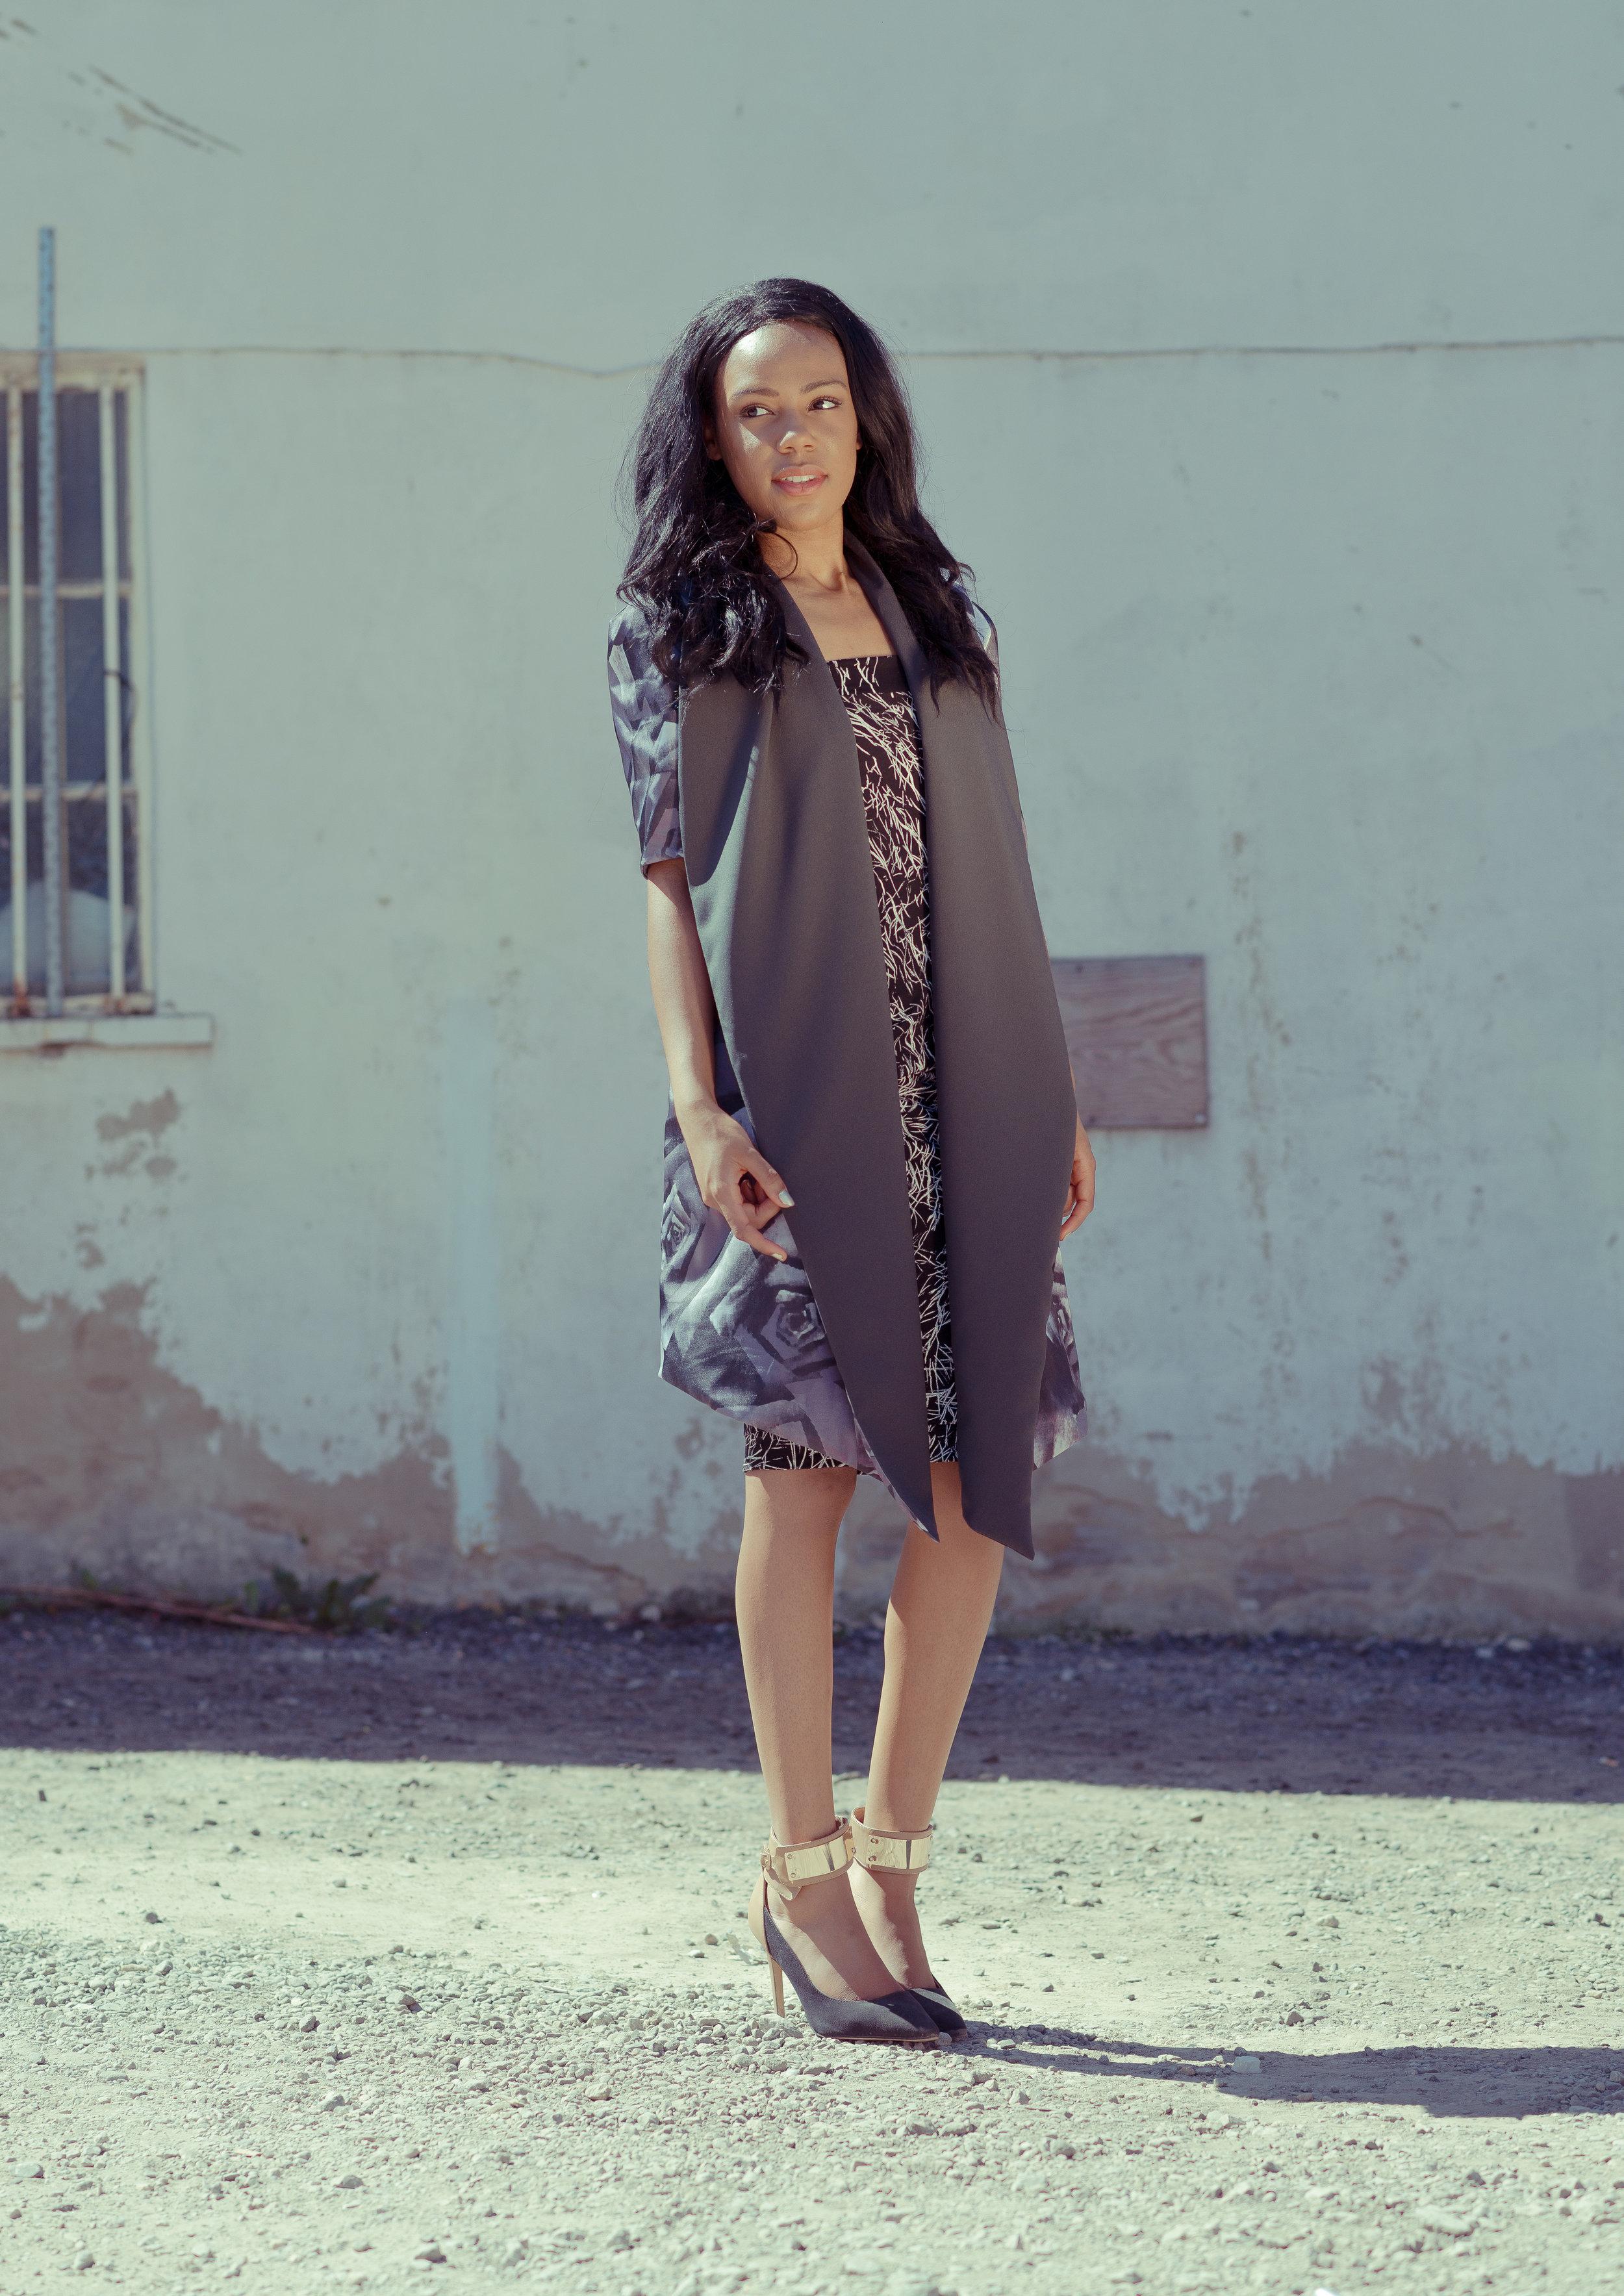 zaramia-ava-zaramiaava-leeds-fashion-designer-ethical-sustainable-tailored-minimalist-mai-grey-print-black-jacket-belt-point-skirt-versatile-drape-cowl-styling-womenswear-models-7